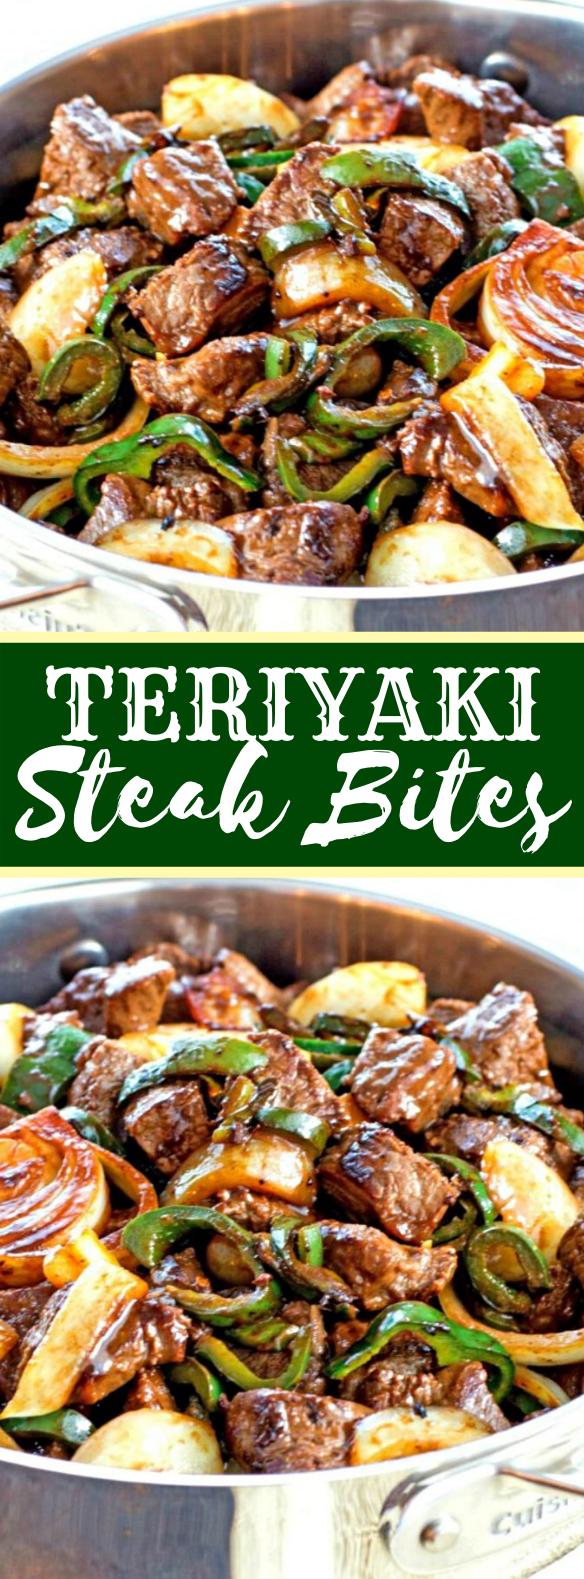 Teriyaki Steak Bites with Green Pepper and Onion #japanesefood #dinner #teriyaki #lunch #comfortfood